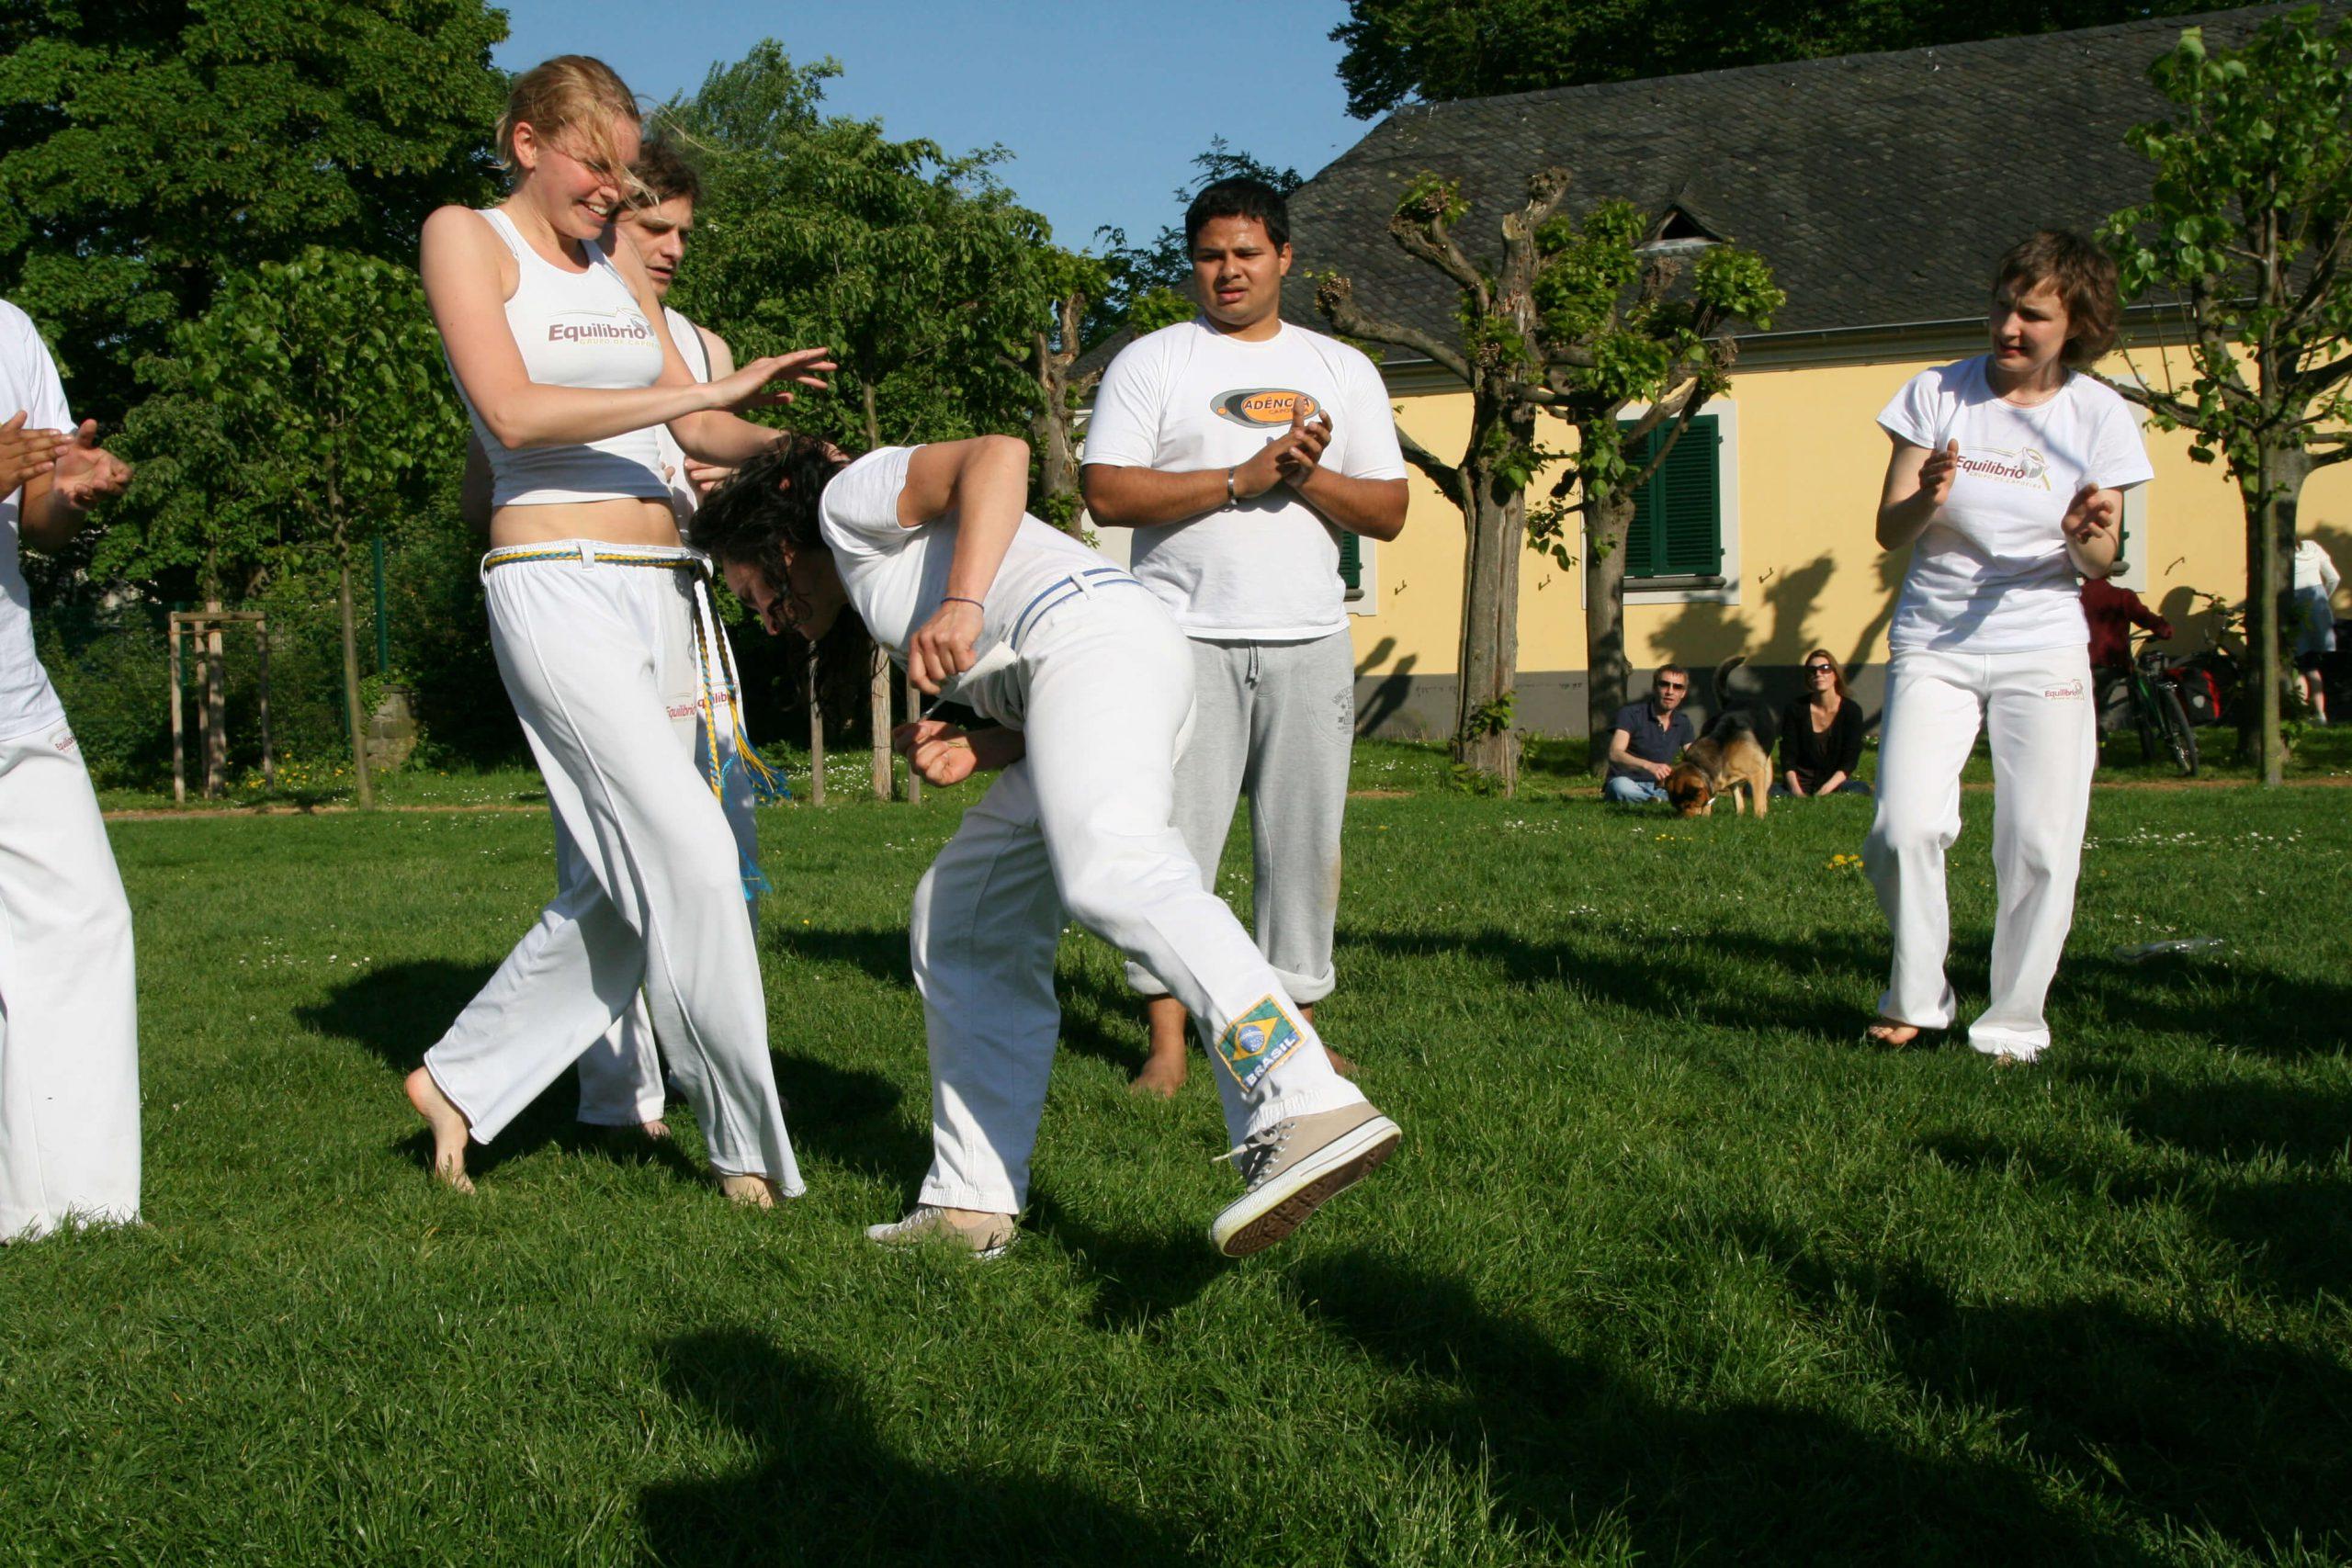 Cabeçada beim Capoeira in Bonn